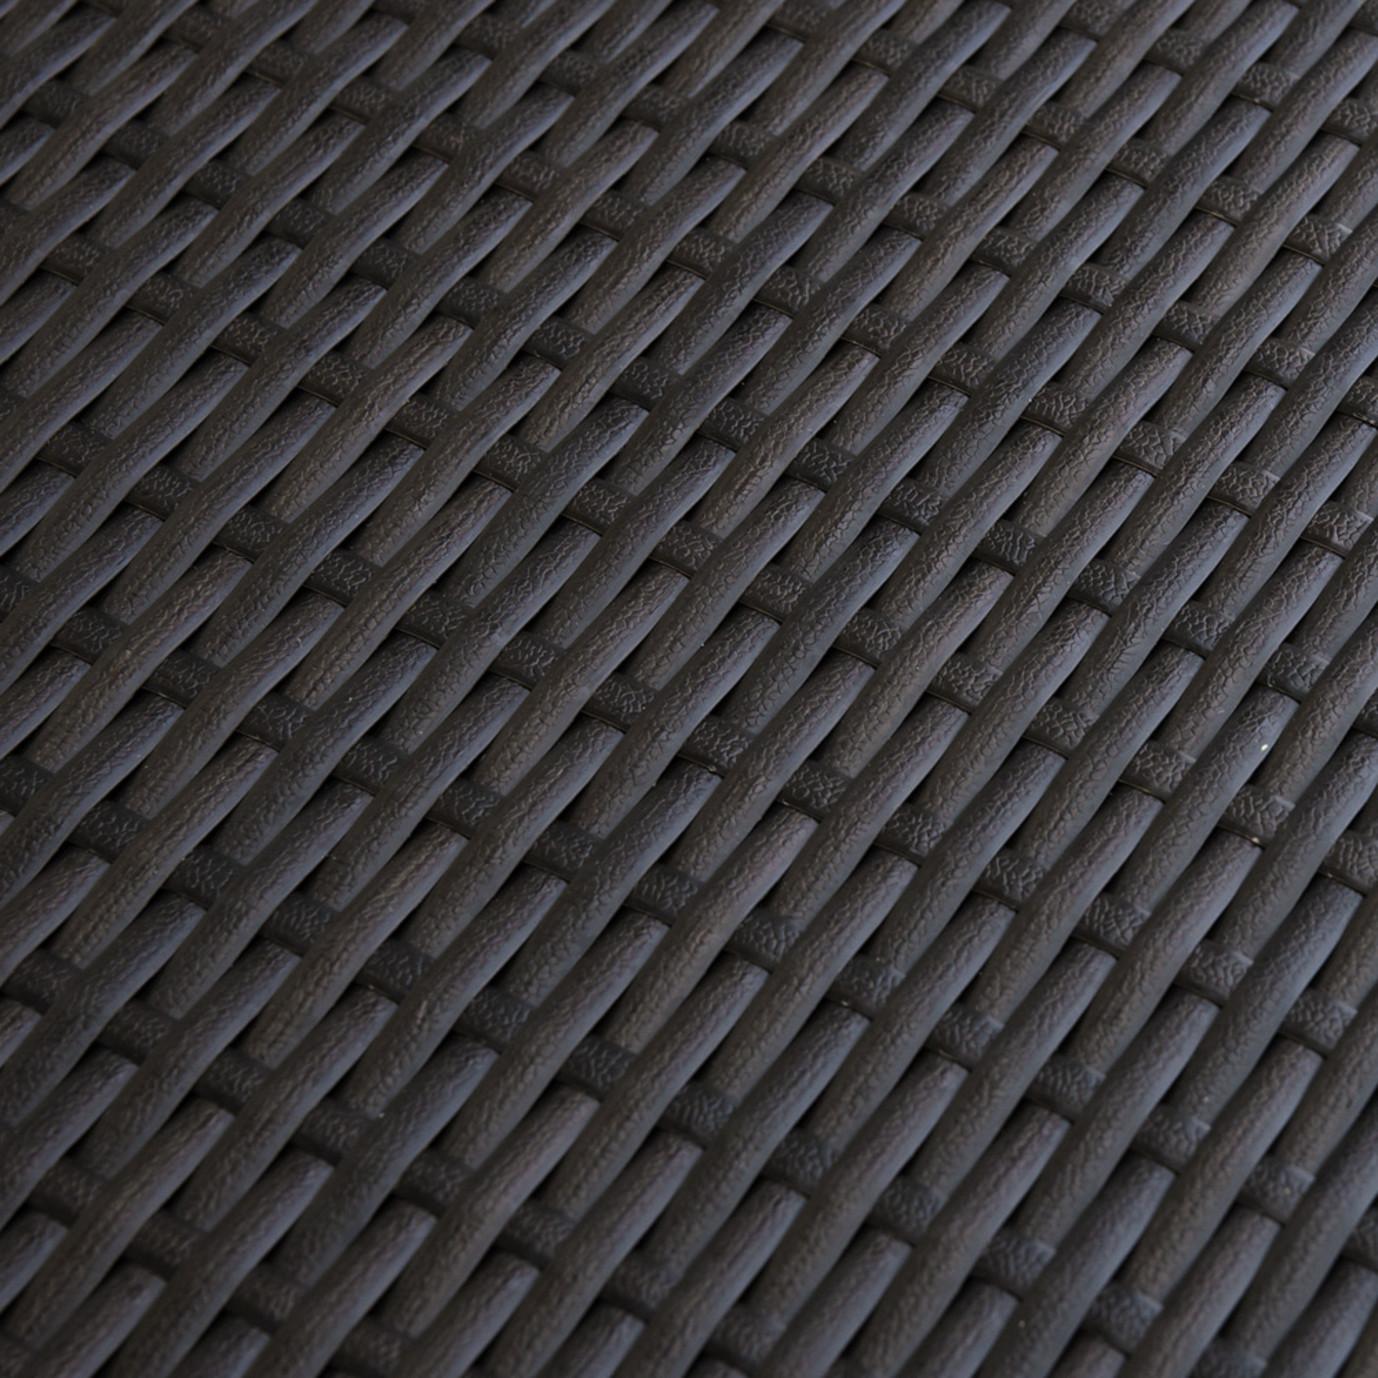 Deco 5pc Motion Club & Ottoman Set - Charcoal Grey